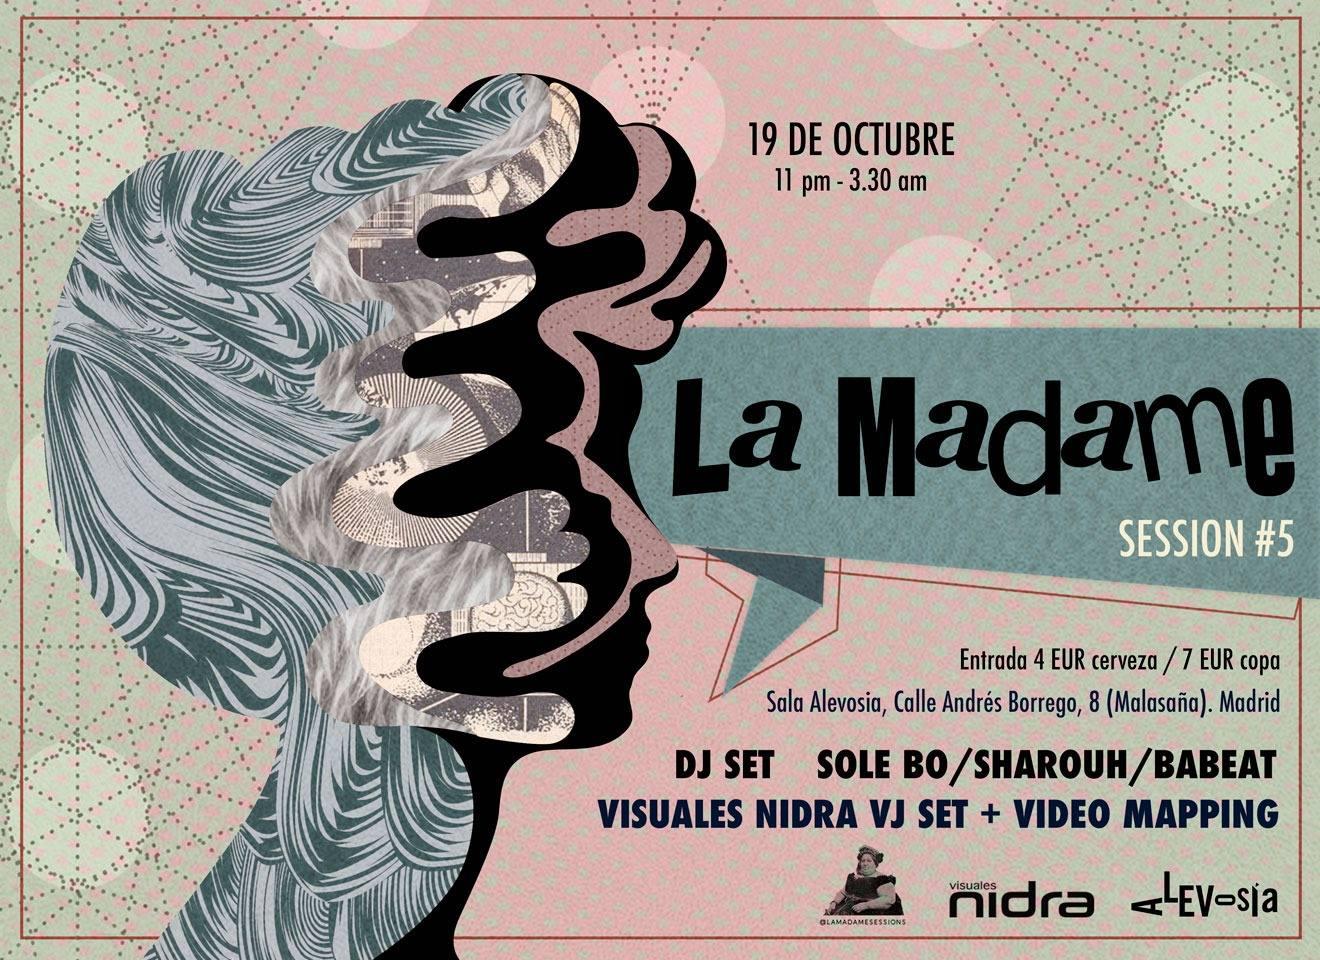 La Madame sessions Club Alevosia Madrid Babeat Sharouh